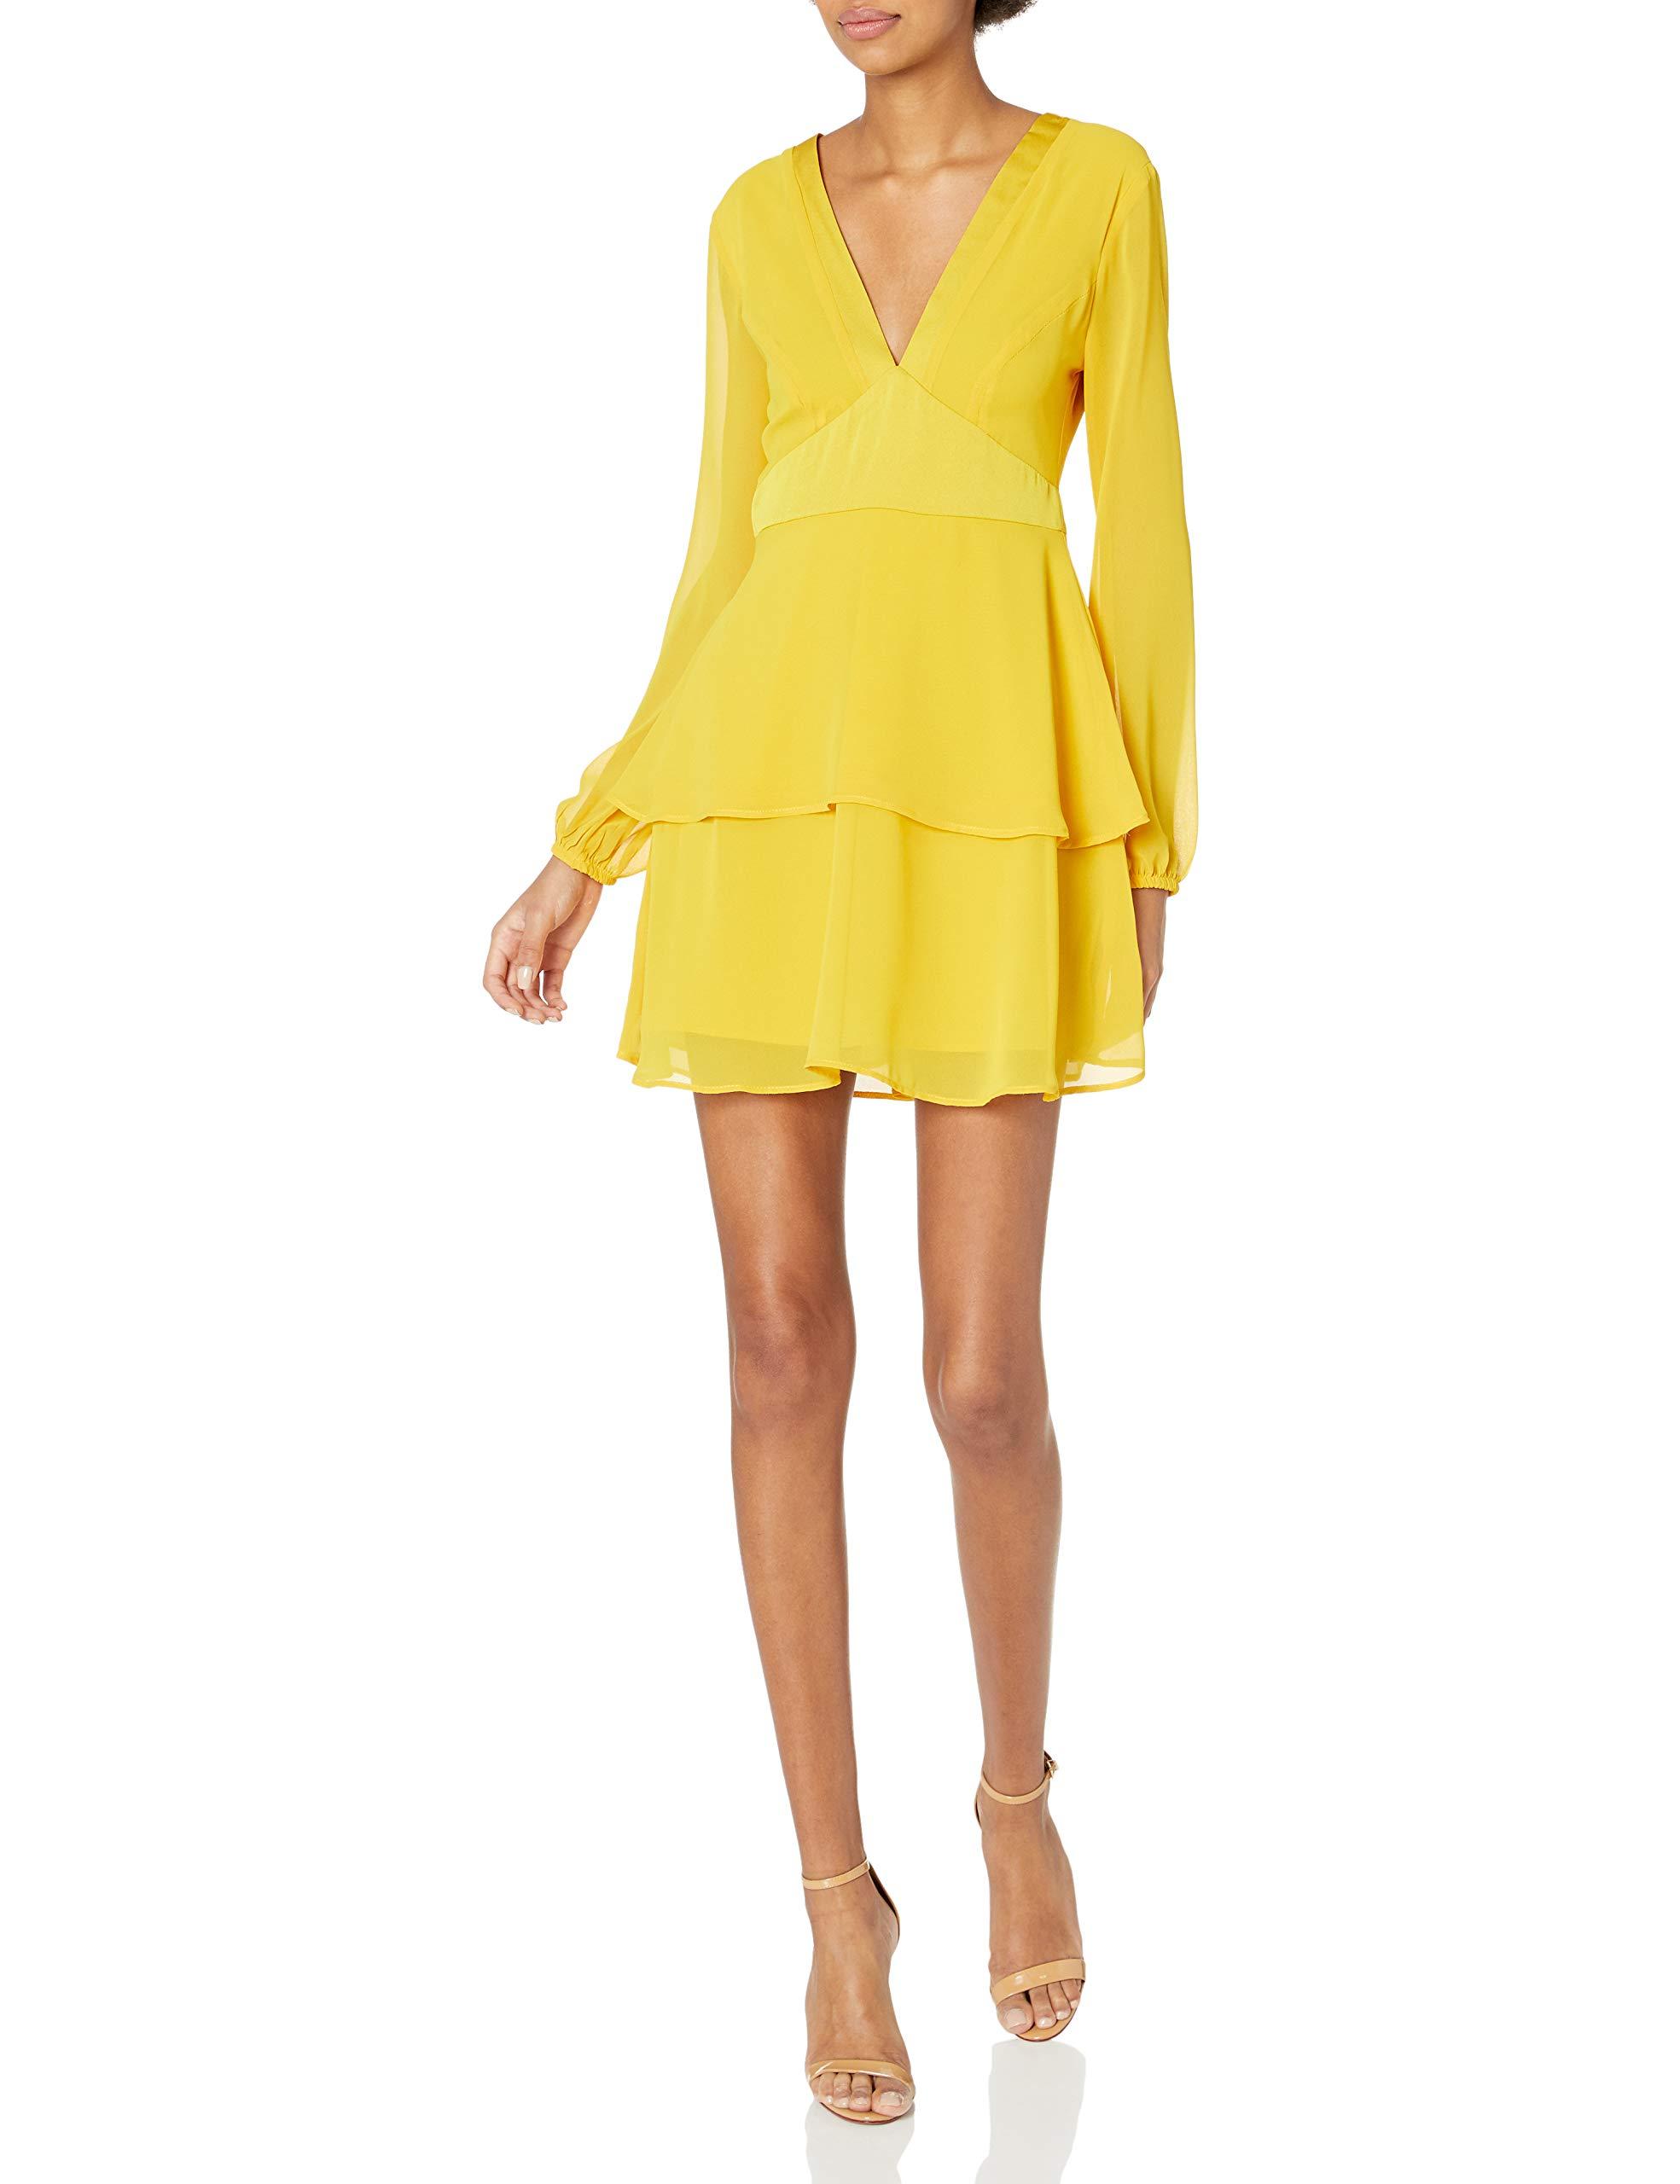 Available at Amazon: BCBGeneration Women's Tiered Ruffle Mini Dress